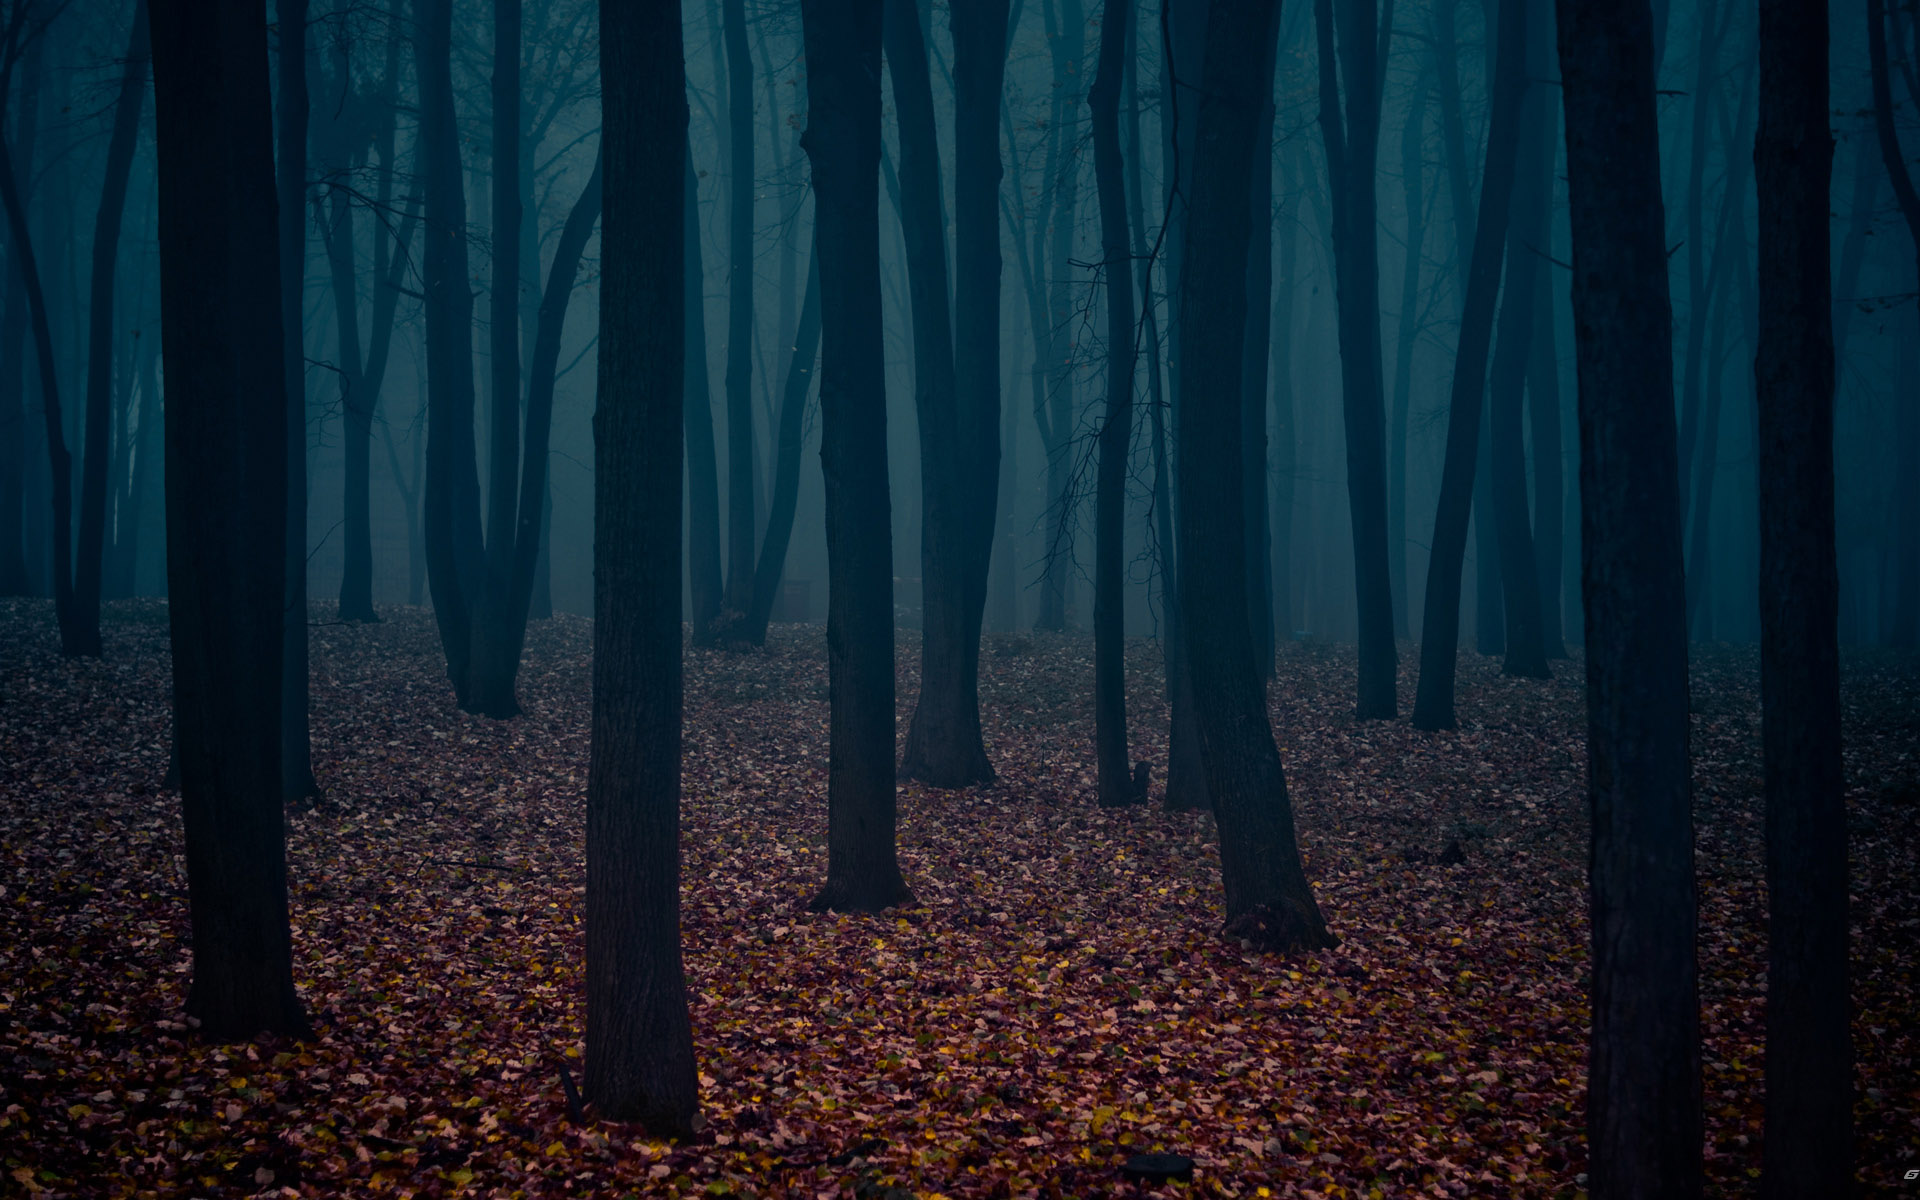 Forest Wallpaper Dark Scary